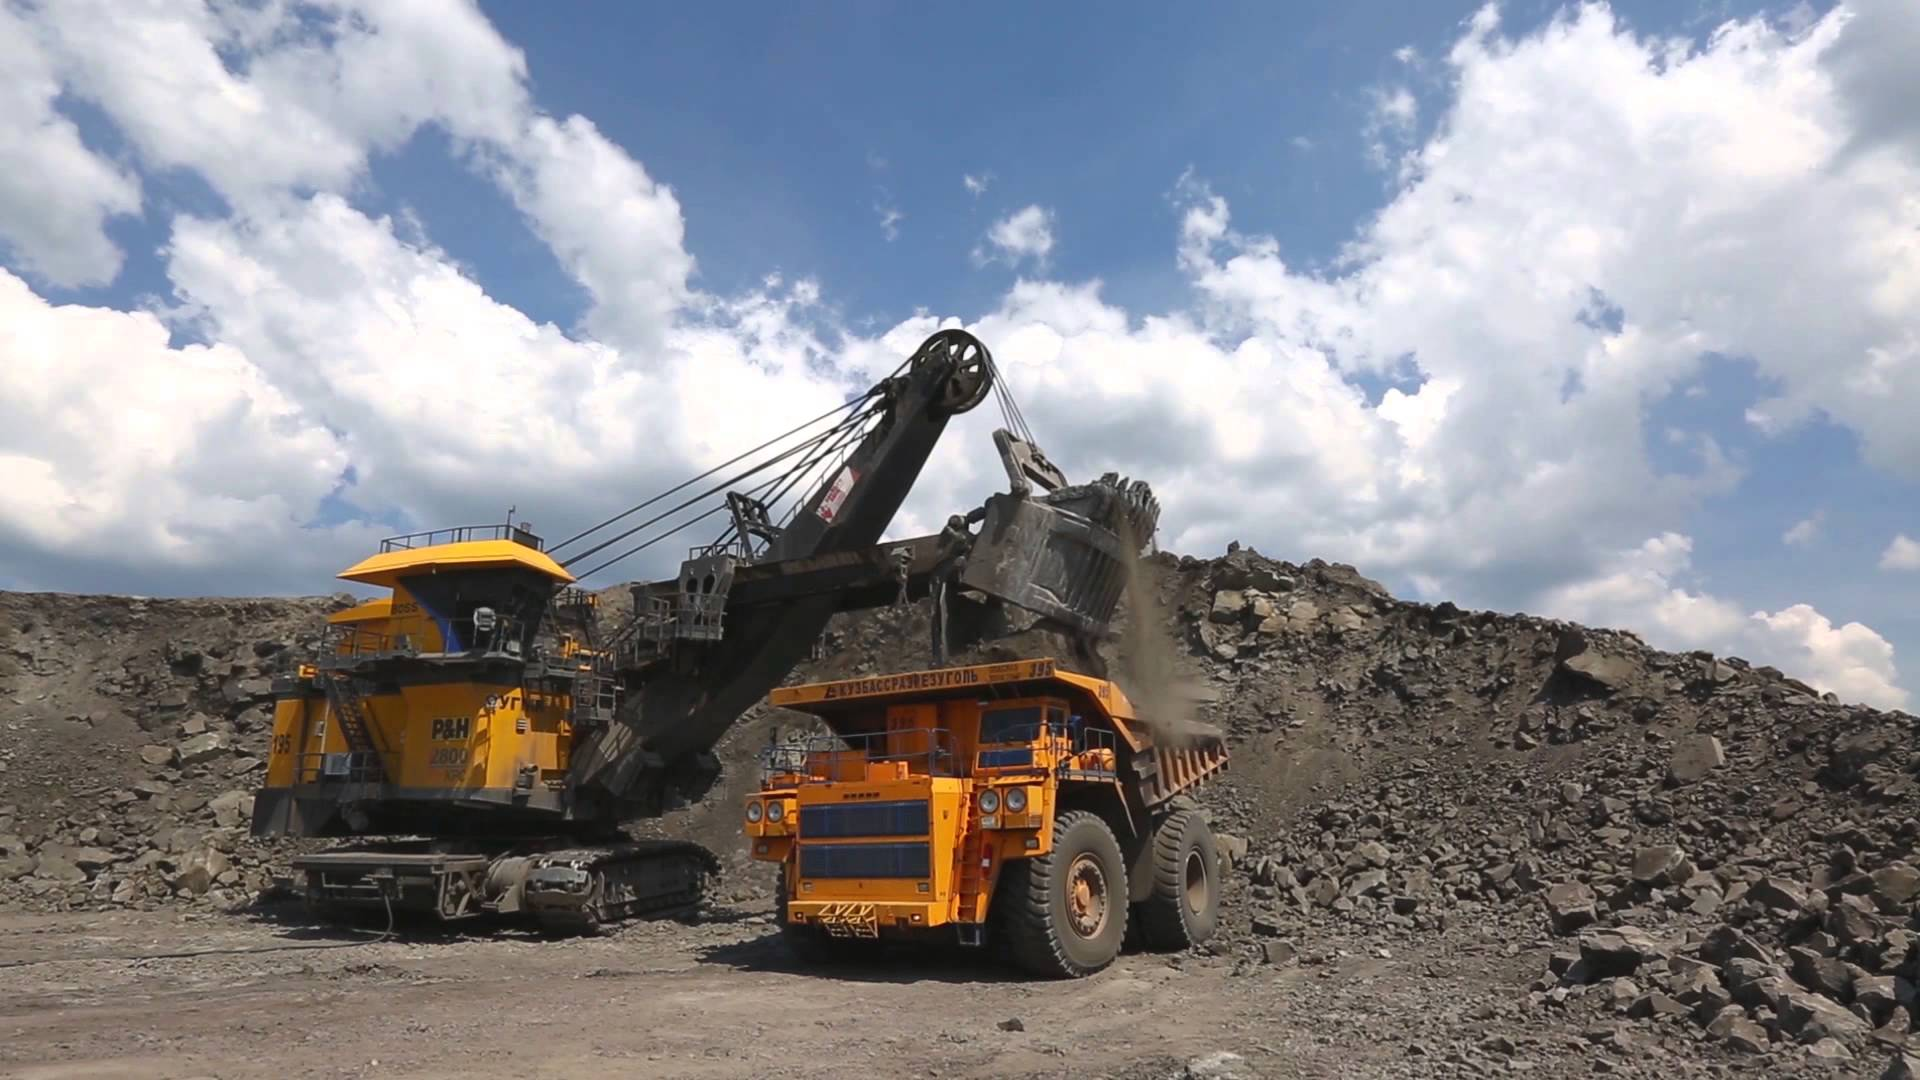 Цены на шубарколький уголь снизятся